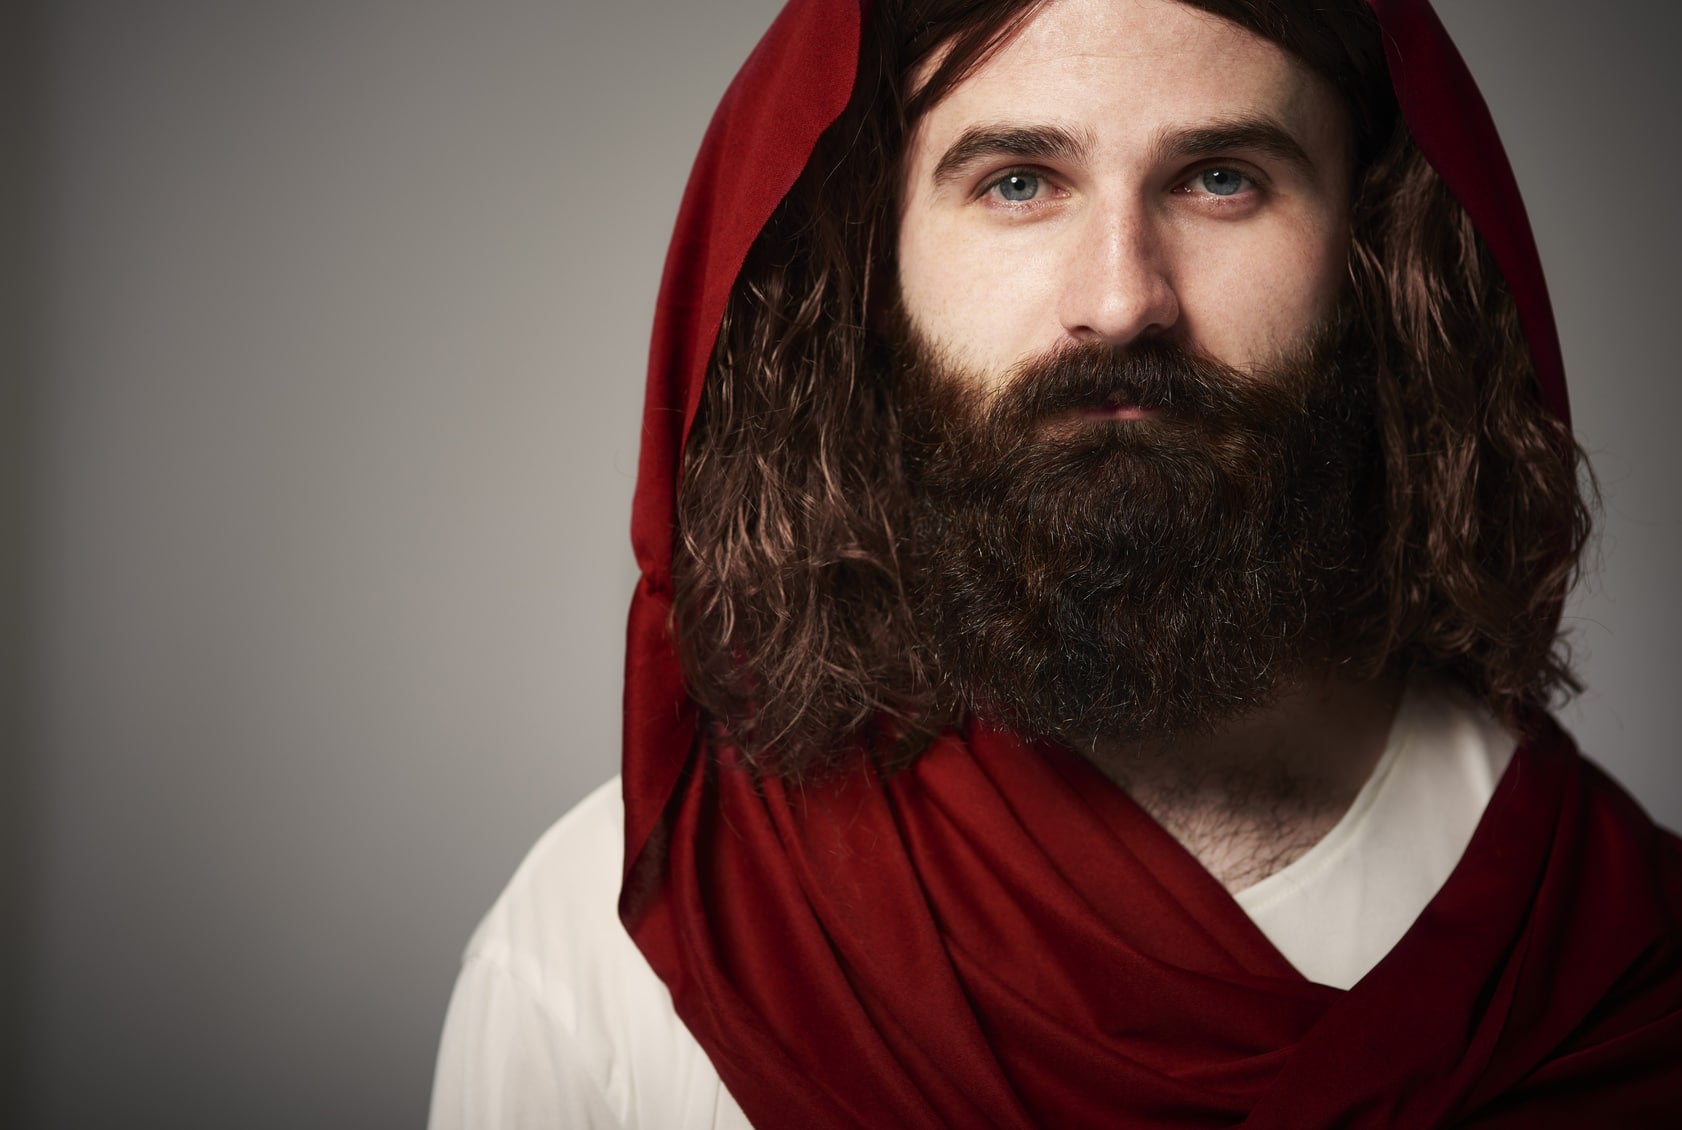 A natureza humana de Jesus (Entrevista Dr. Amin Rodor)